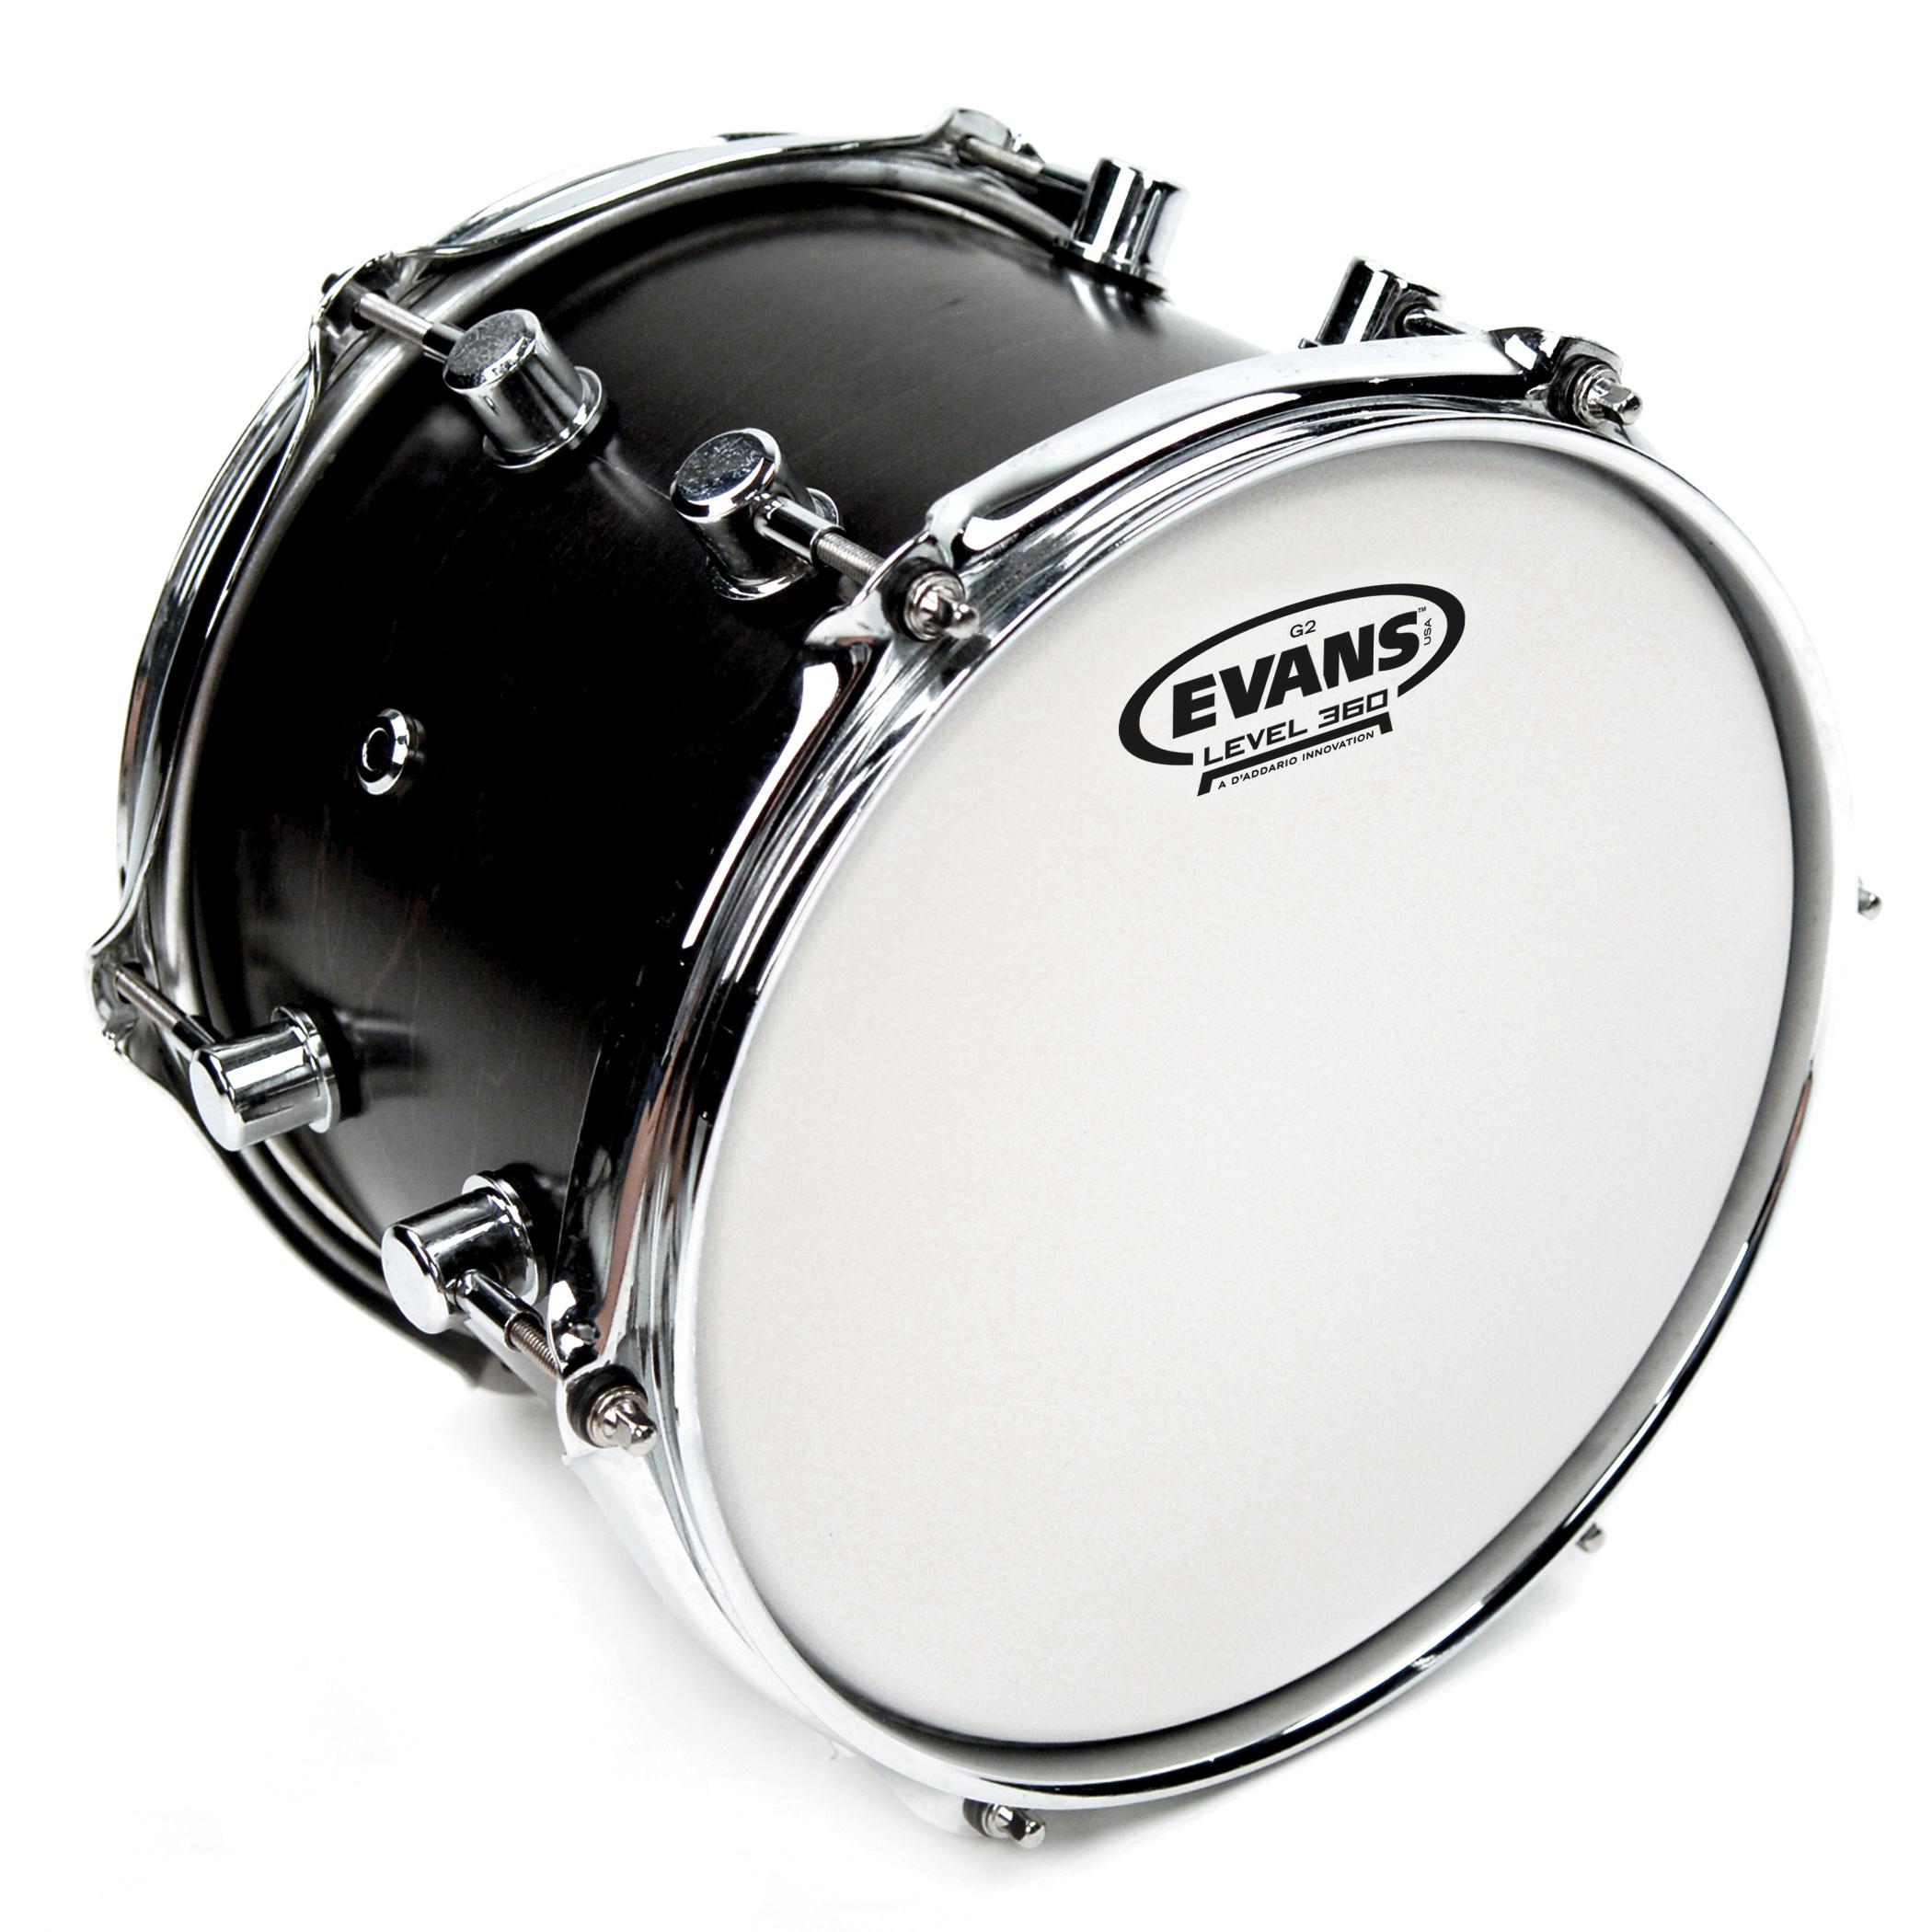 evans g2 coated drum head 10 inch musical instruments. Black Bedroom Furniture Sets. Home Design Ideas